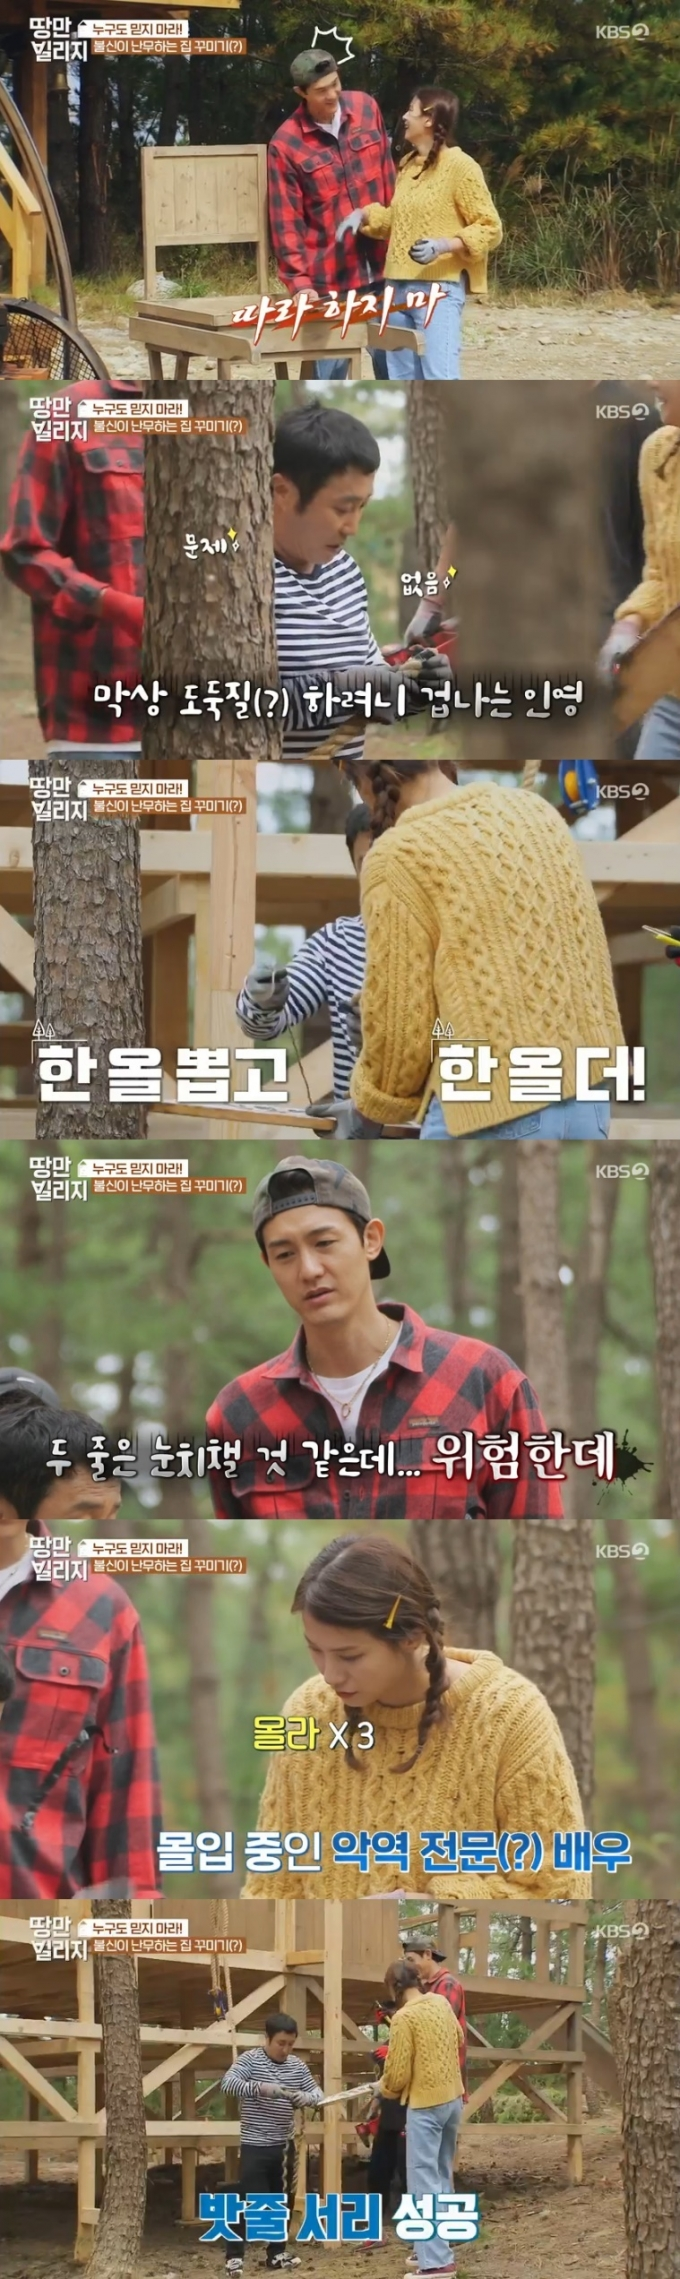 KBS 2TV '땅만빌리지' 캡처 © 뉴스1